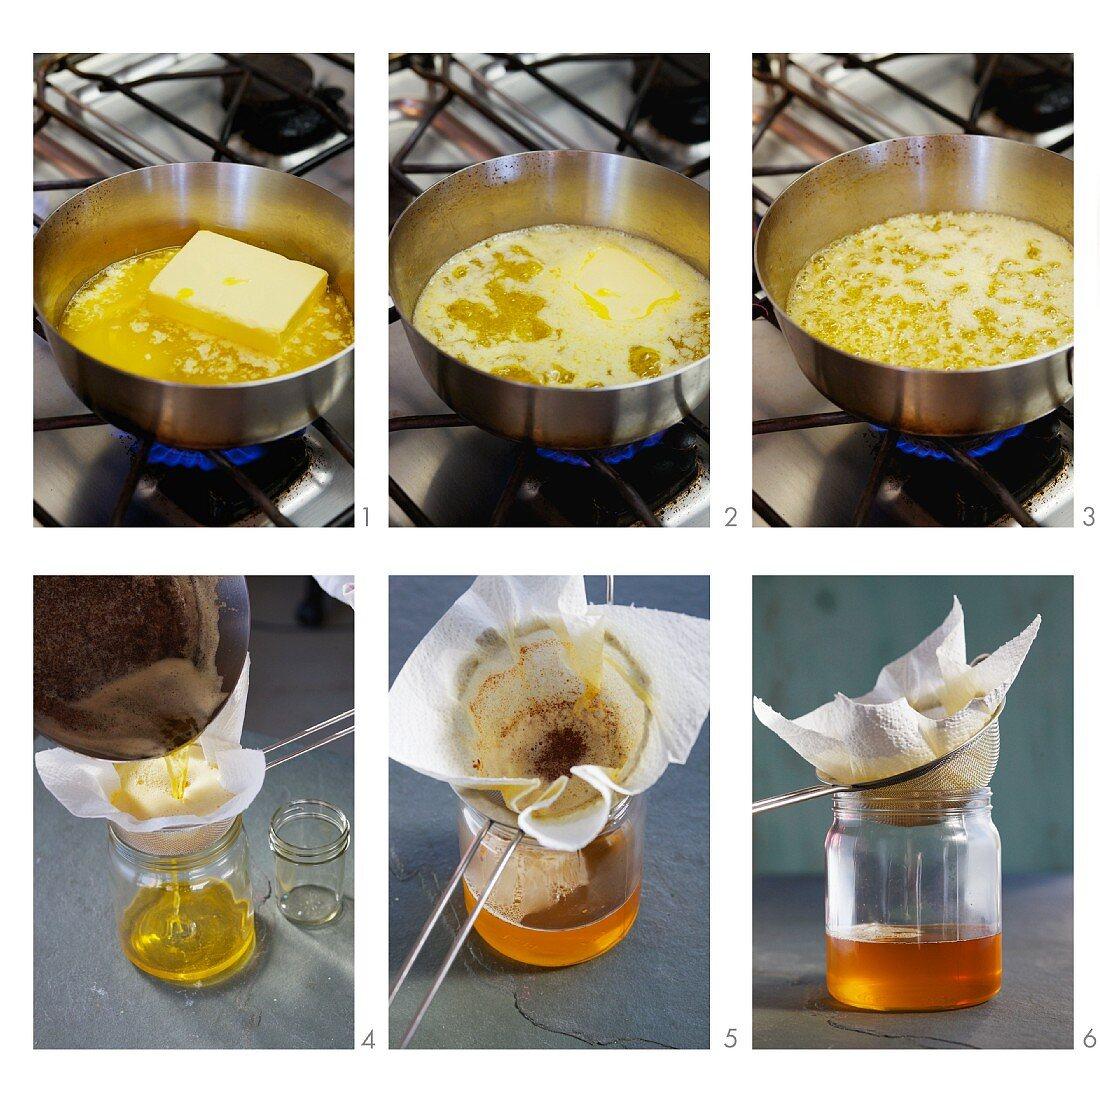 Clarified butter (ghee) being made